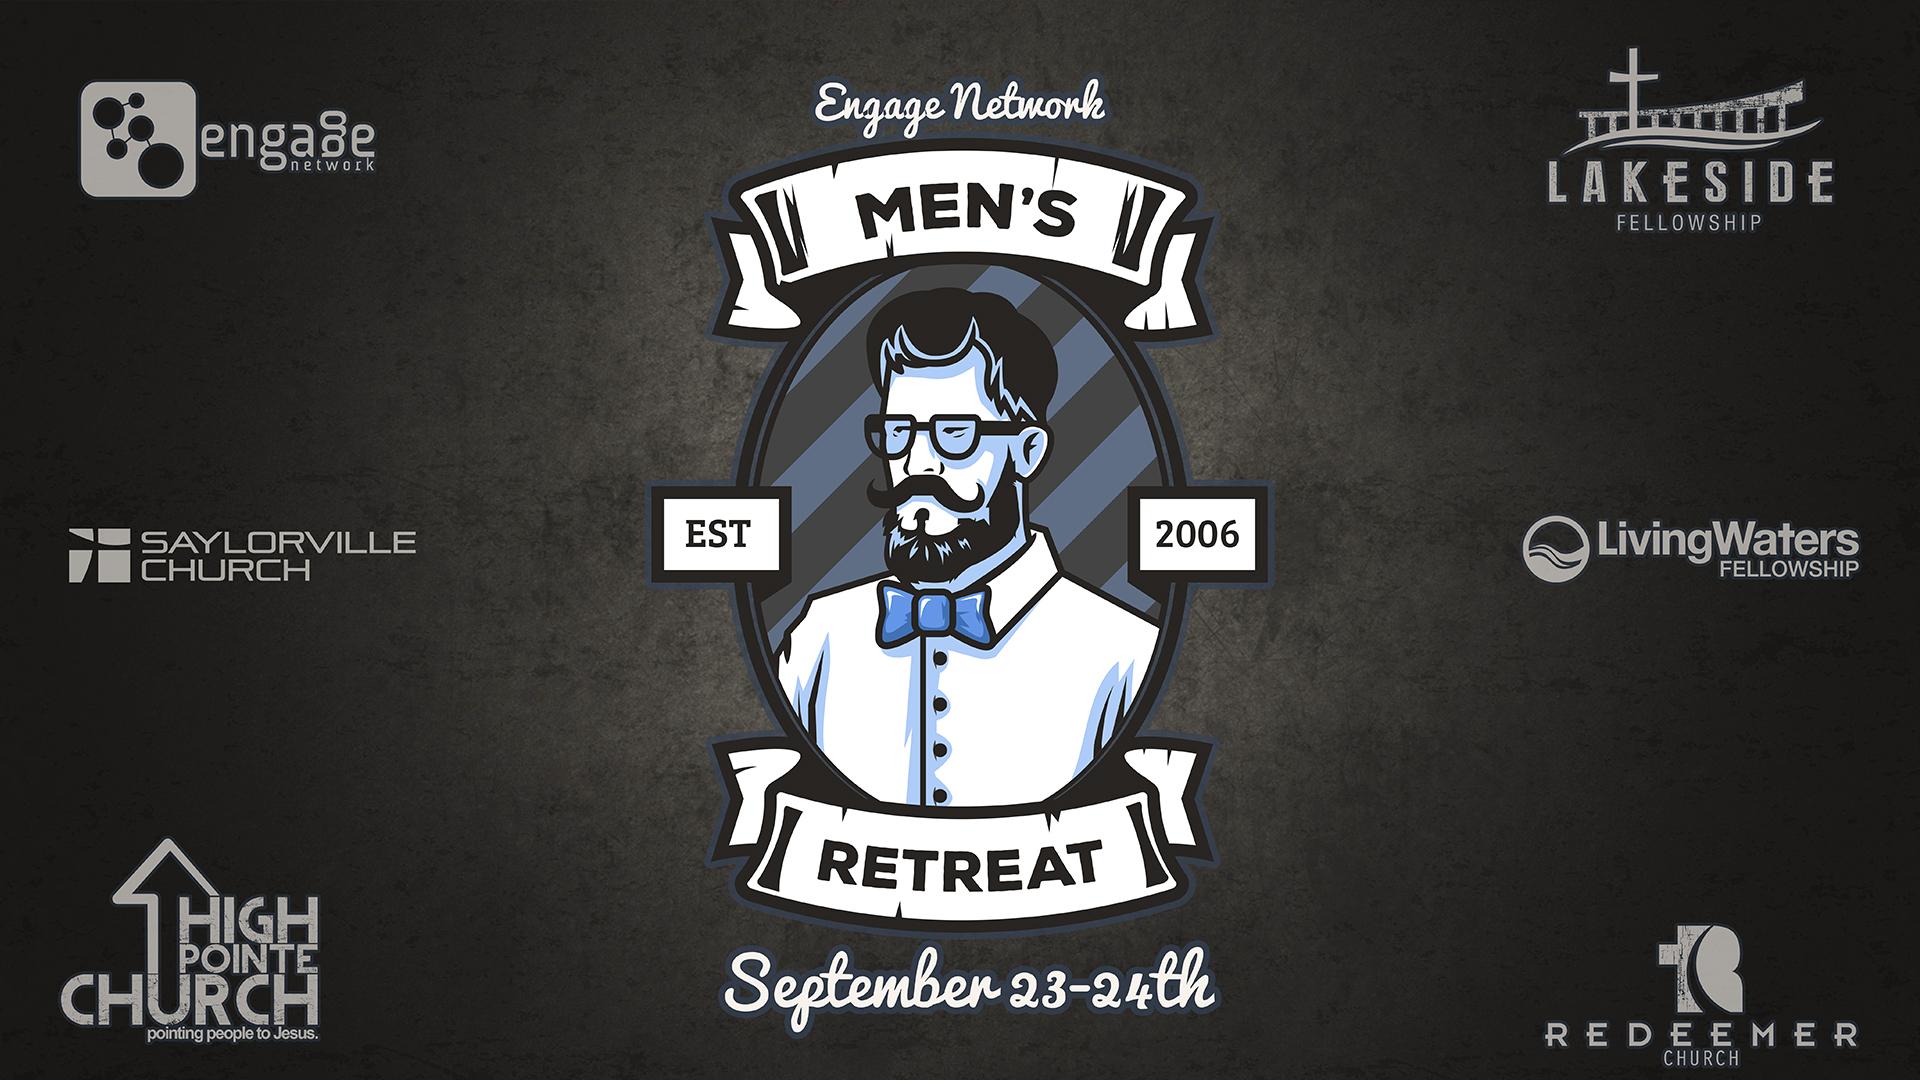 Engage Men's Retreat 2016